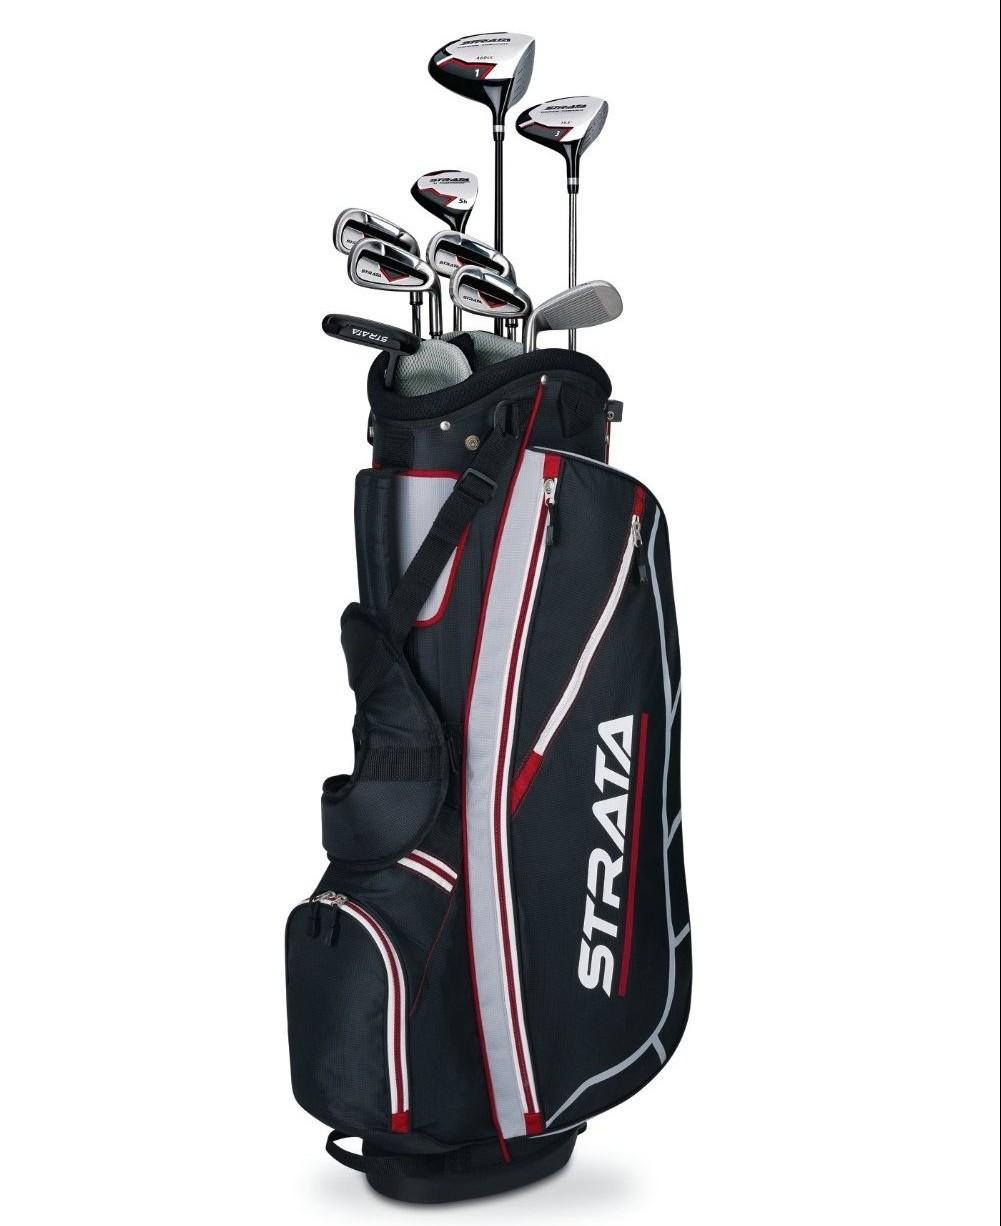 golf-club-sale-story-e1433262876941.jpg